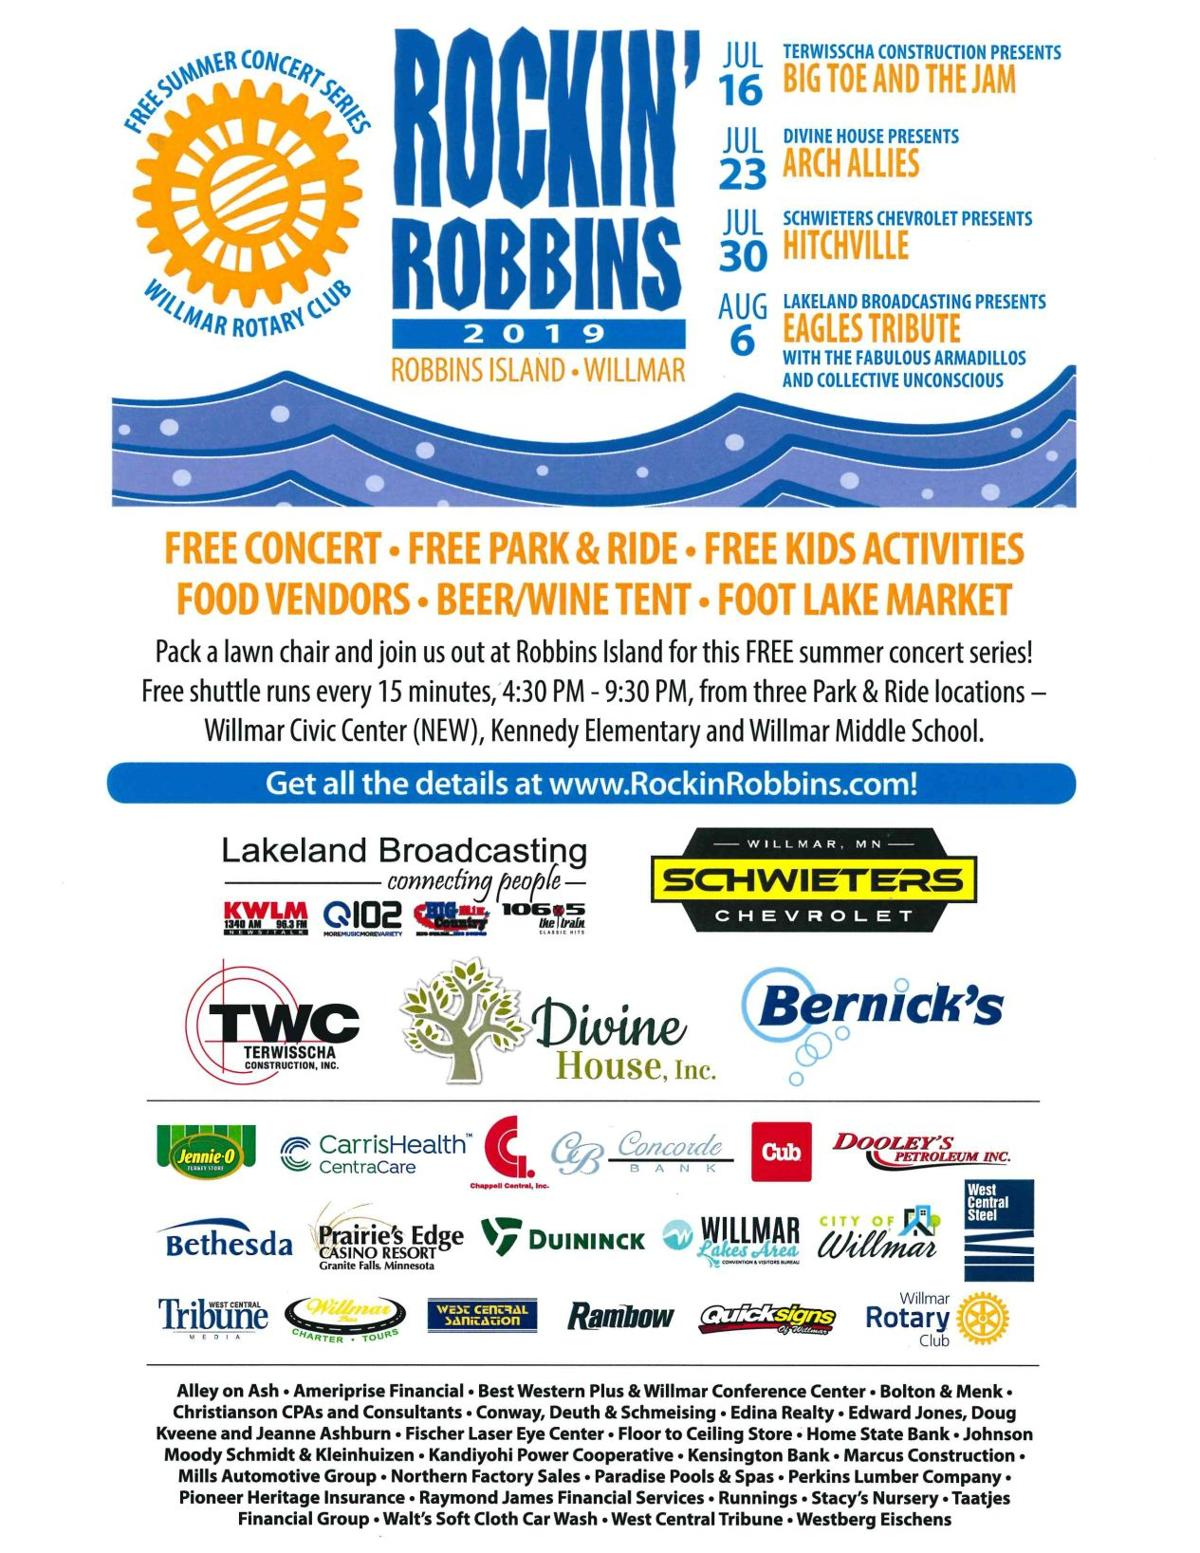 Rockin' Robbins 2019 Concert Series